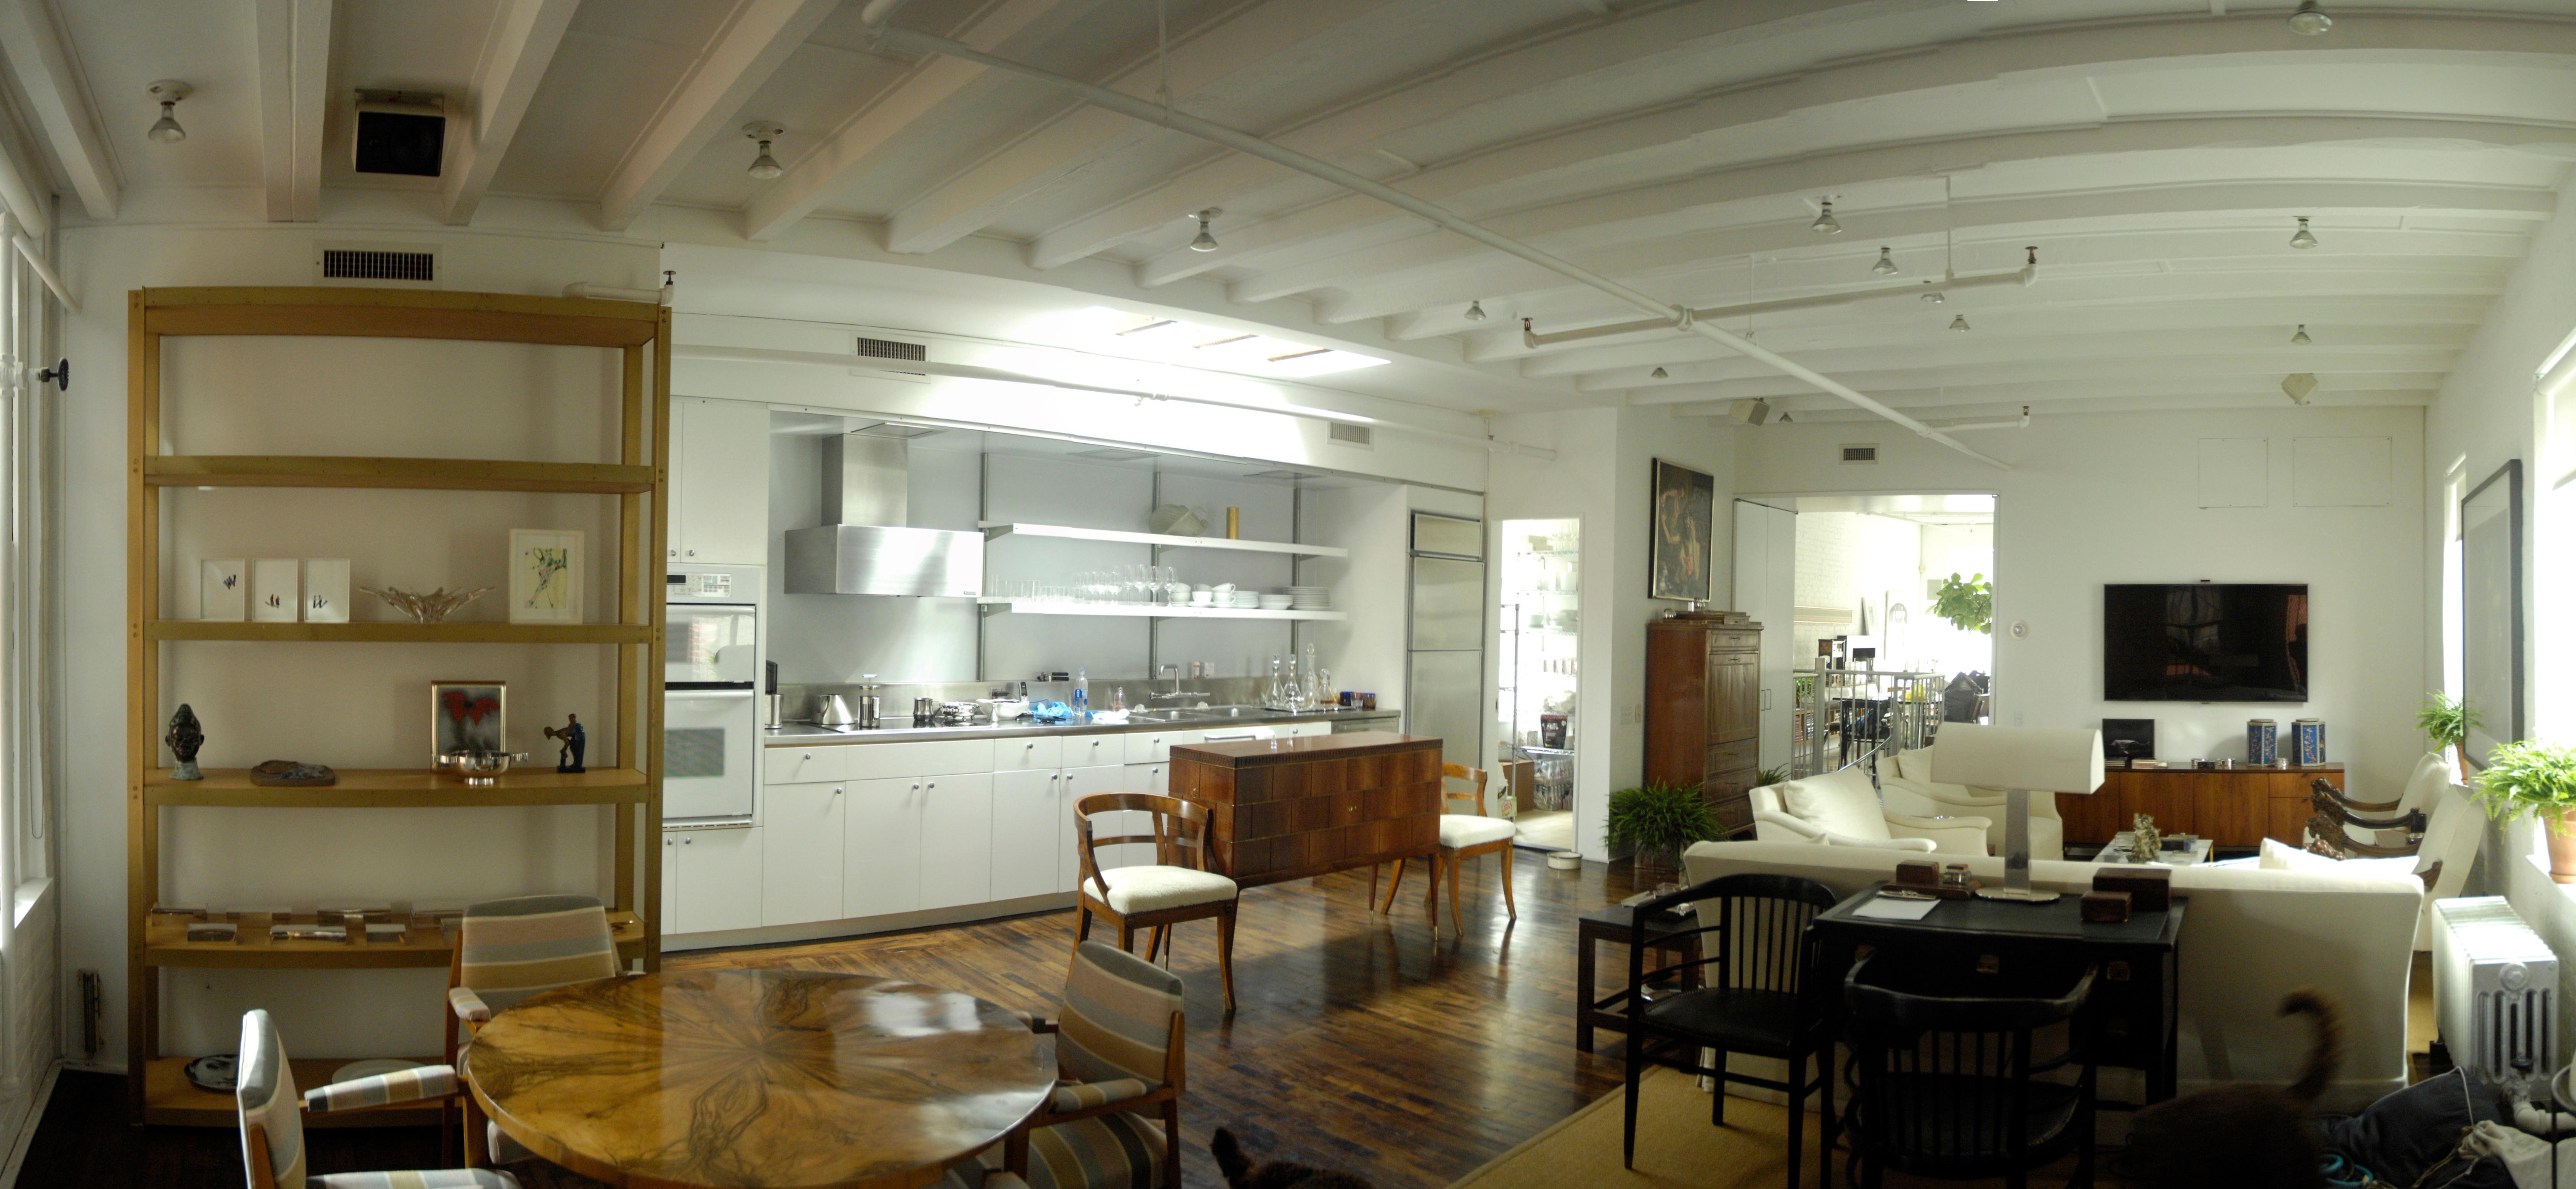 Real Estate Photography in Austin or San Antonio, Texas